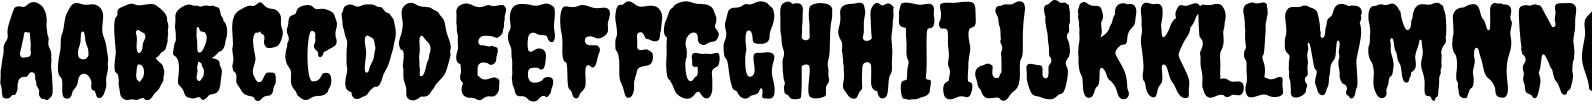 Creepster Pro